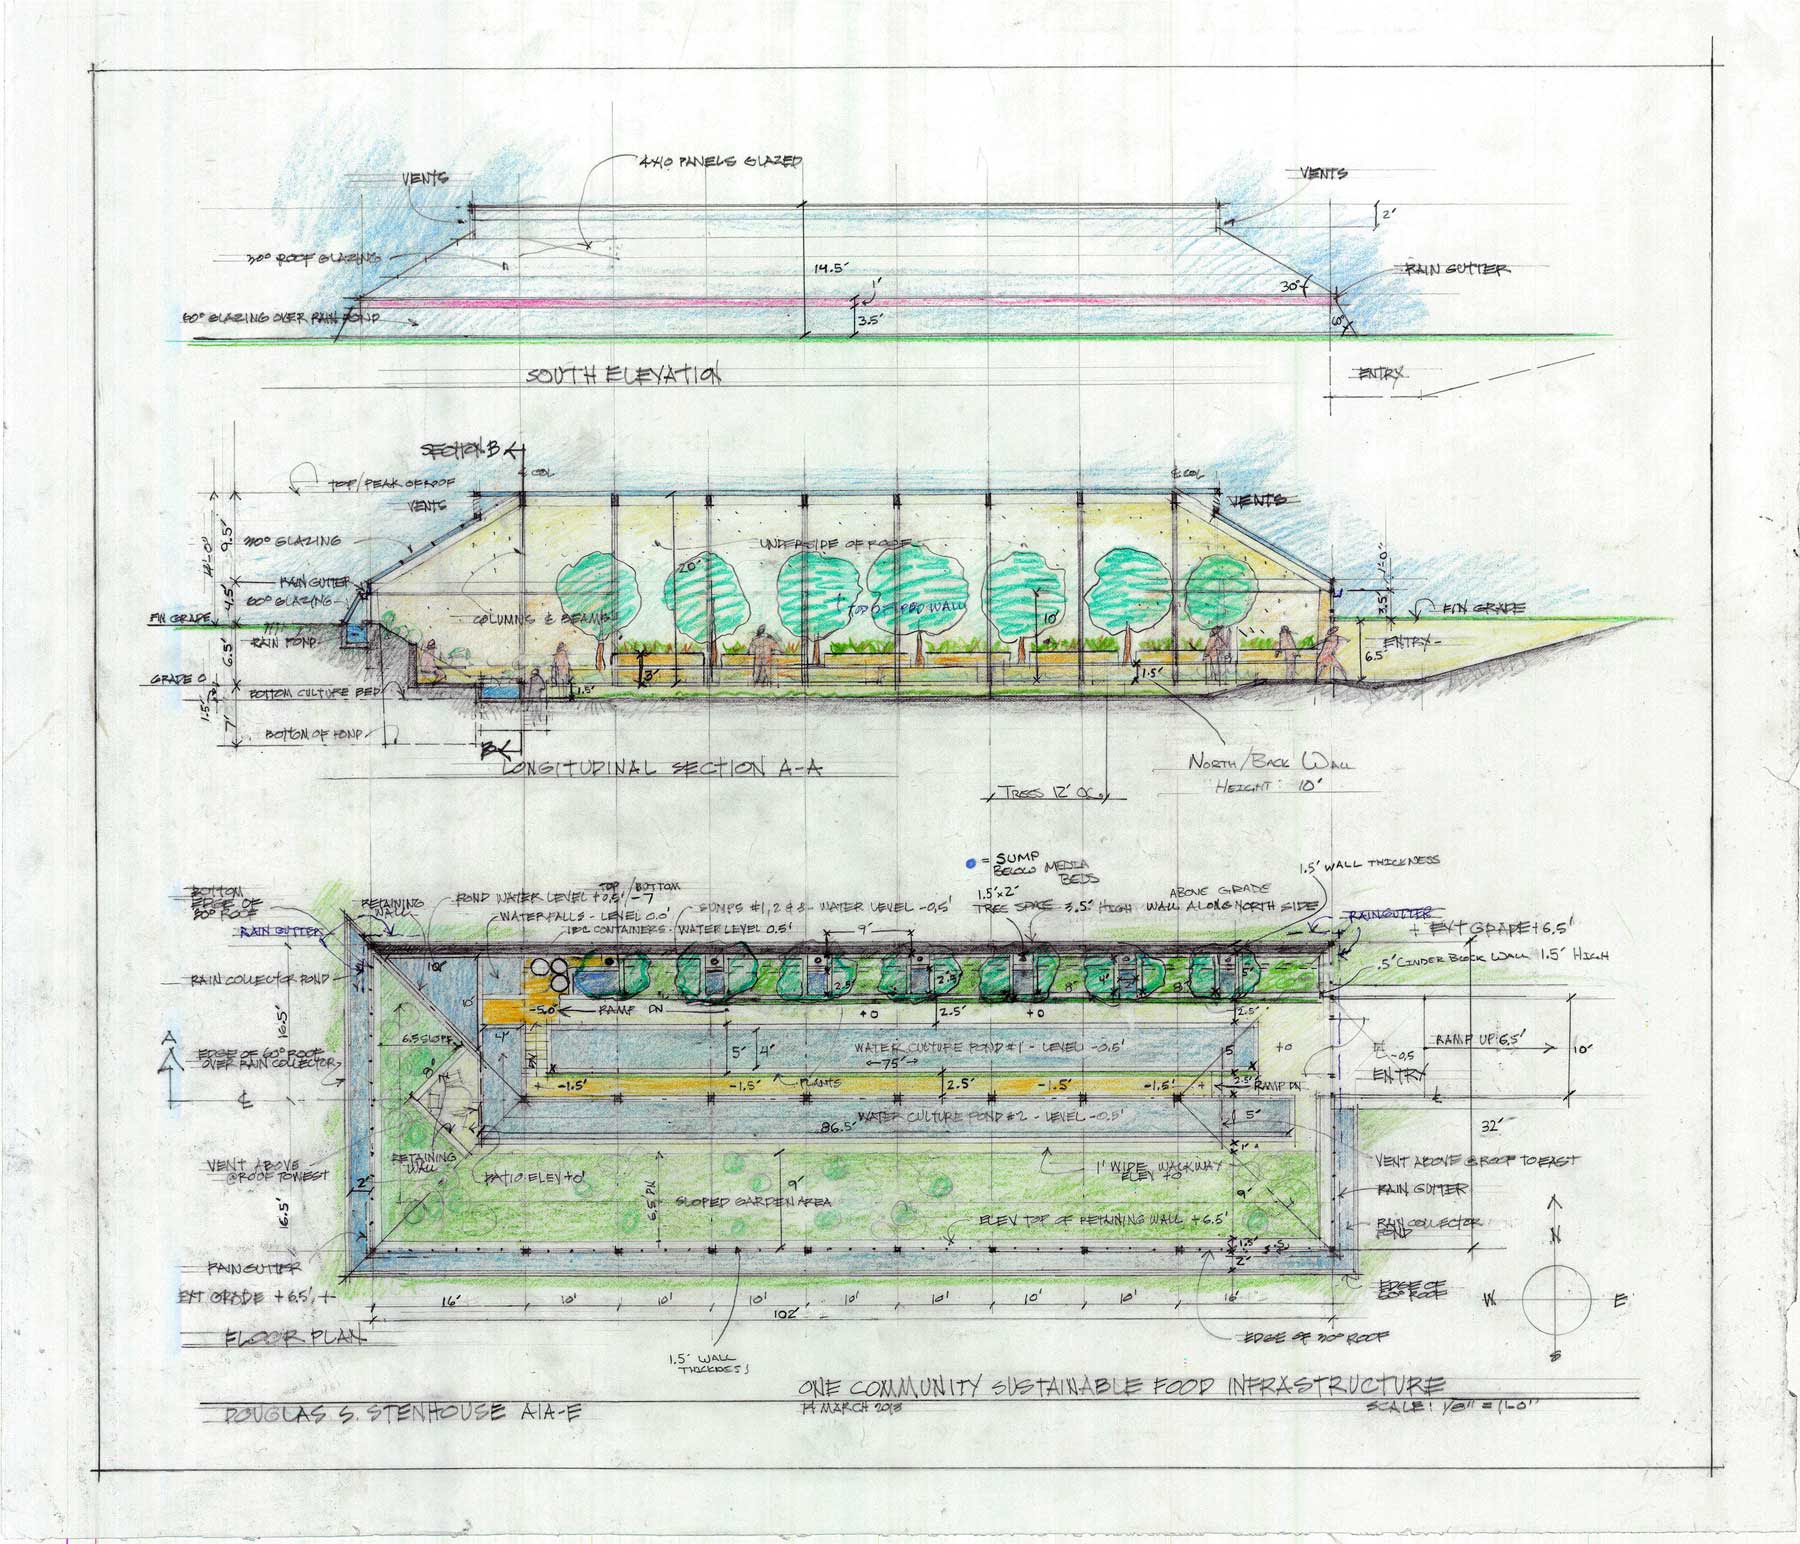 Aquaponics Construction Plans Aquaponic